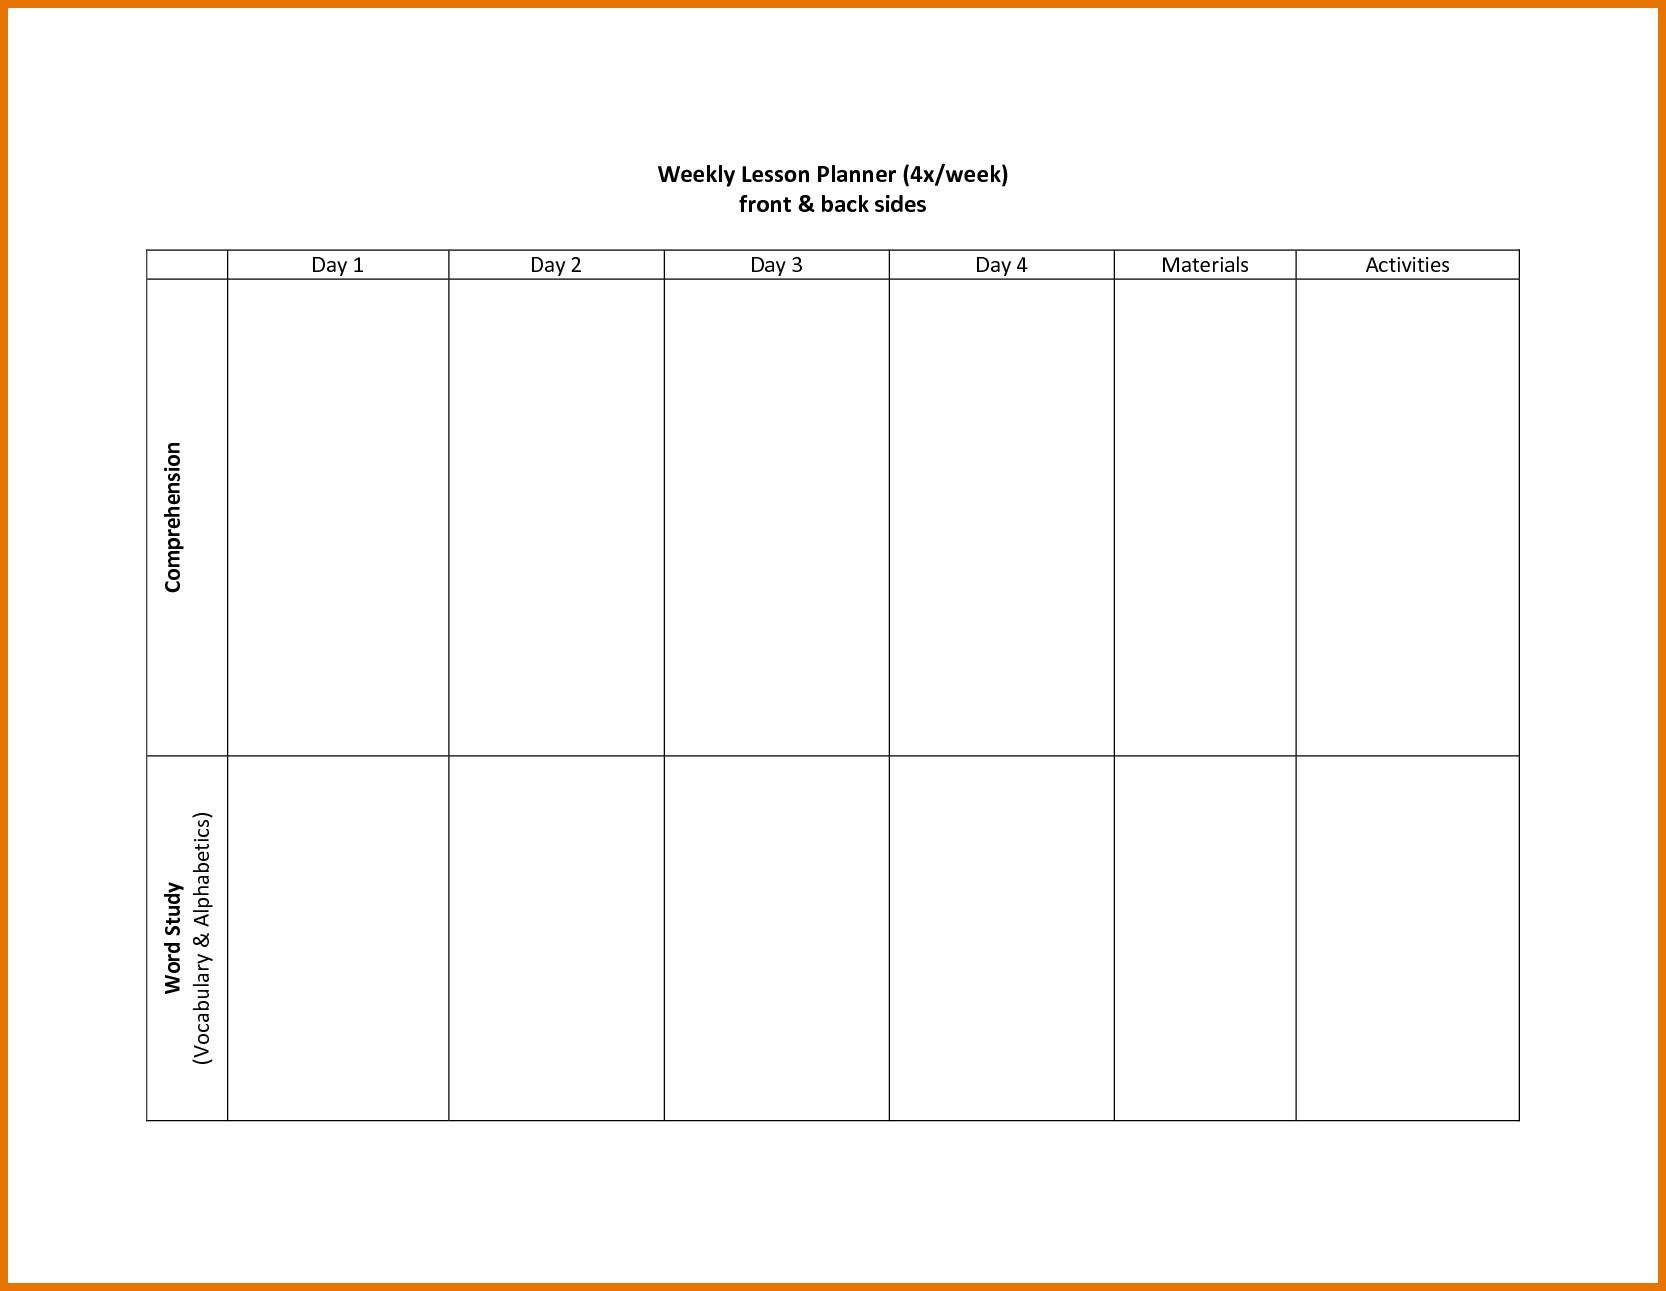 Two Weeks Calendar Template Week Impression So Printable For Two in Two Week Blank Calendar Template